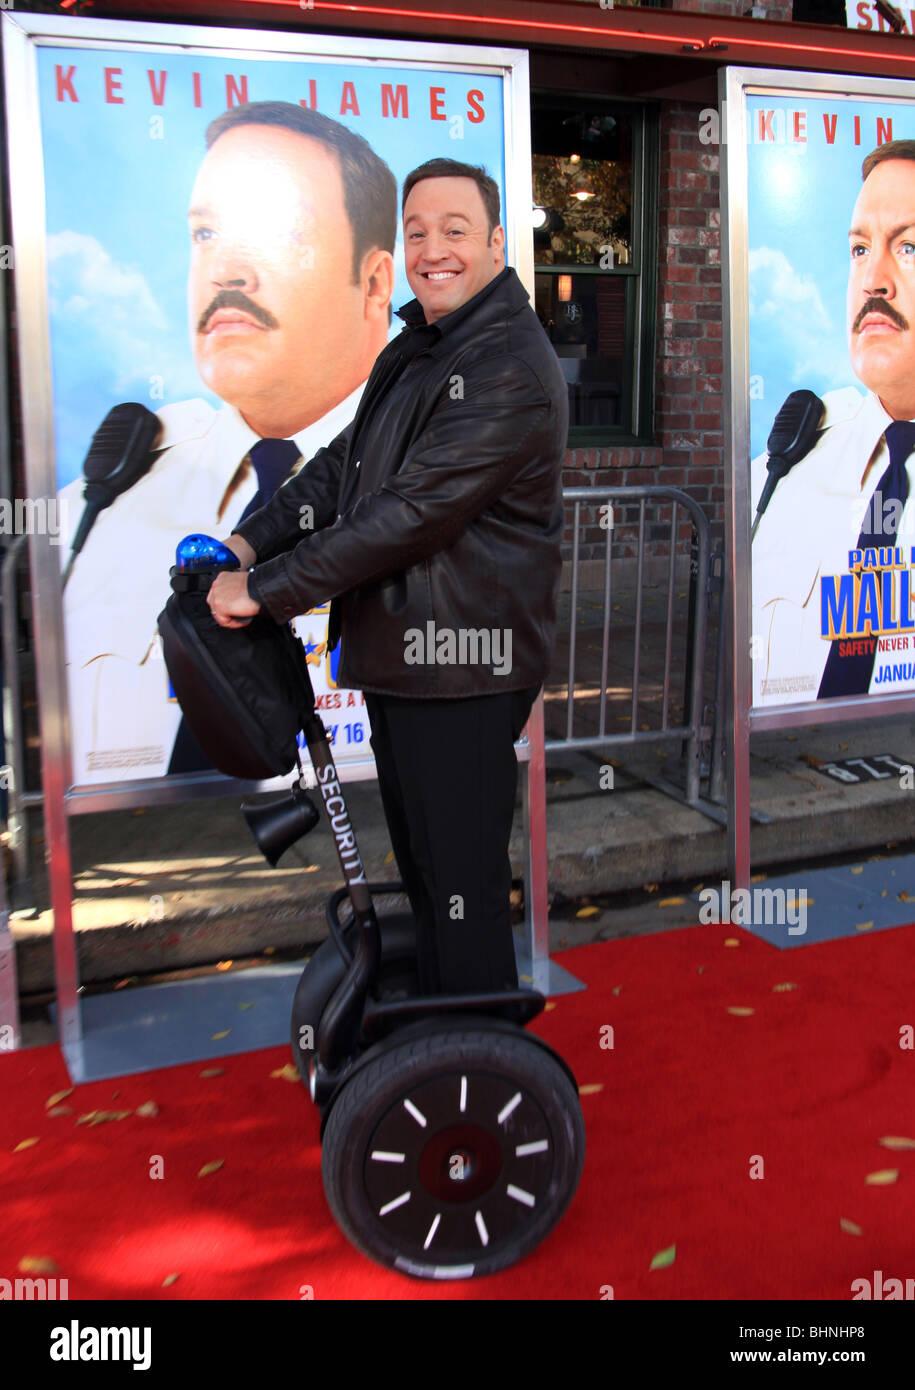 Kevin James Paul Blart Mall Cop Film Premiere Los Angeles Ca Usa 10 Stock Photo Alamy